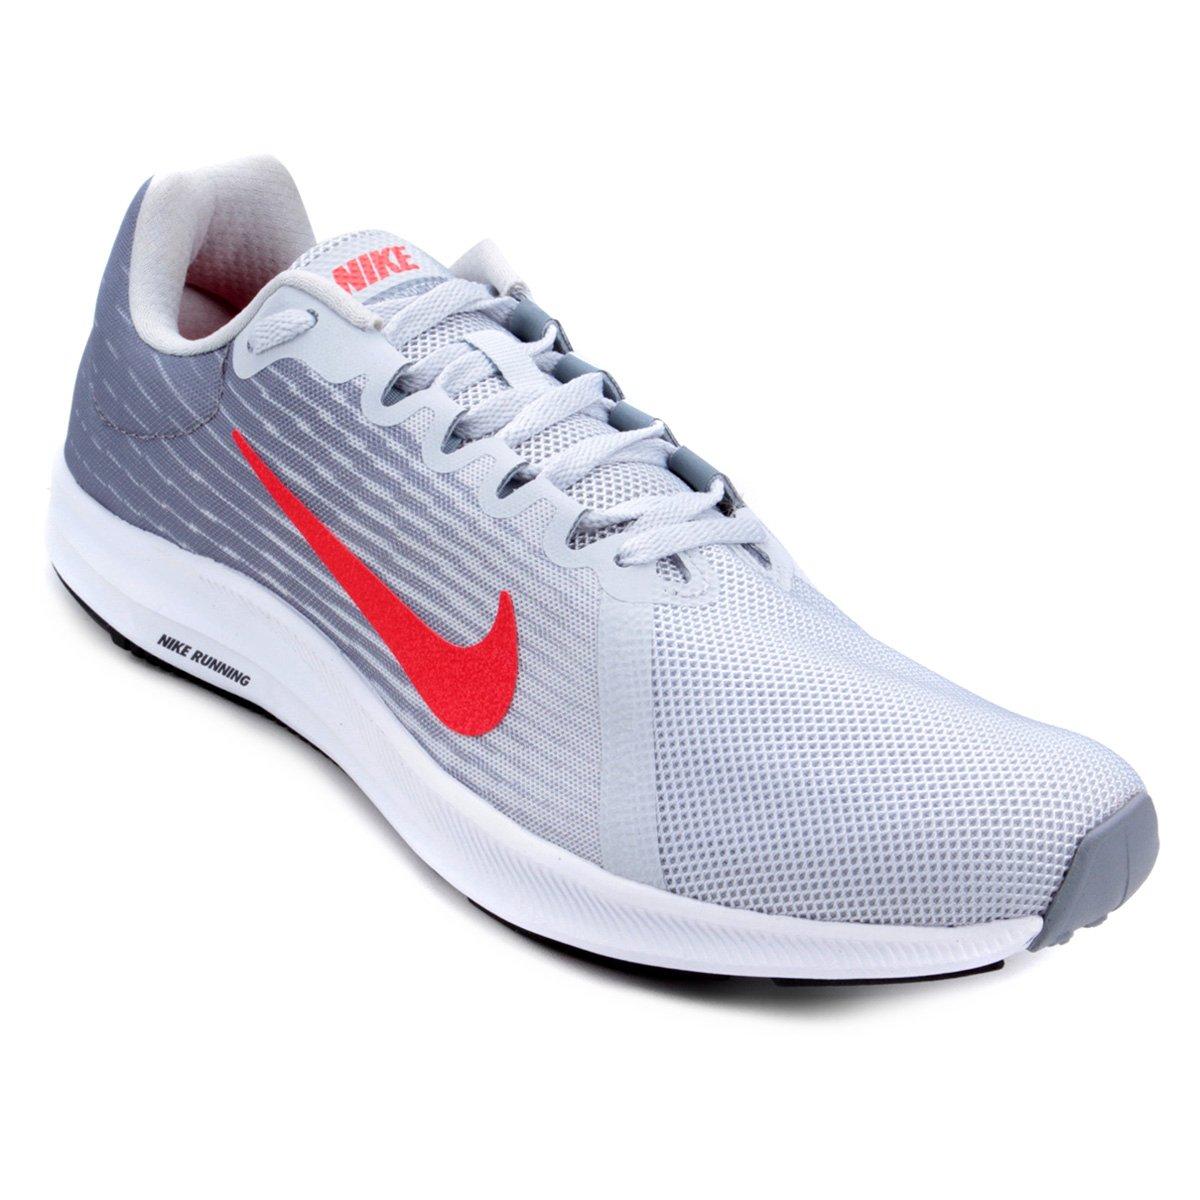 f0f8cbe30d Tênis Nike Wmns Downshifter 8 Masculino Cinza e Vermelho - Compre ...